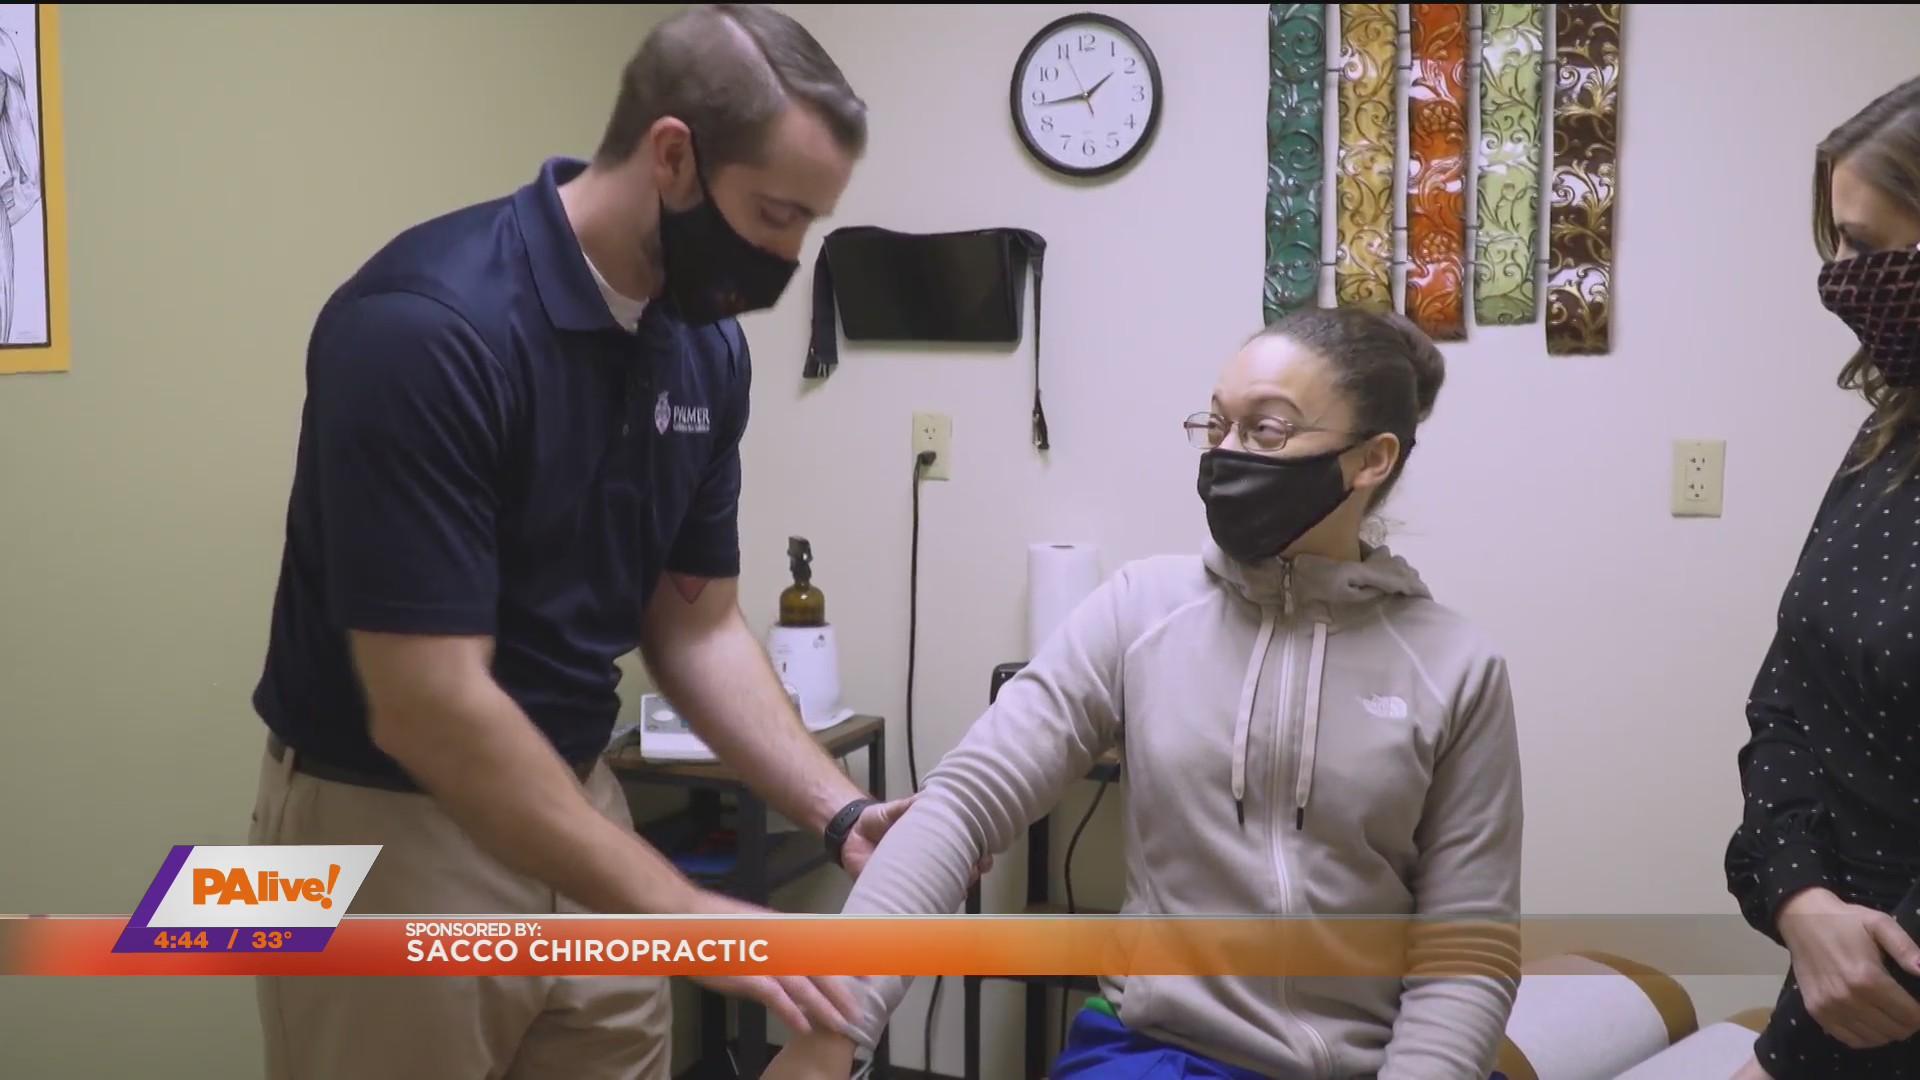 Sacco Chiropractic